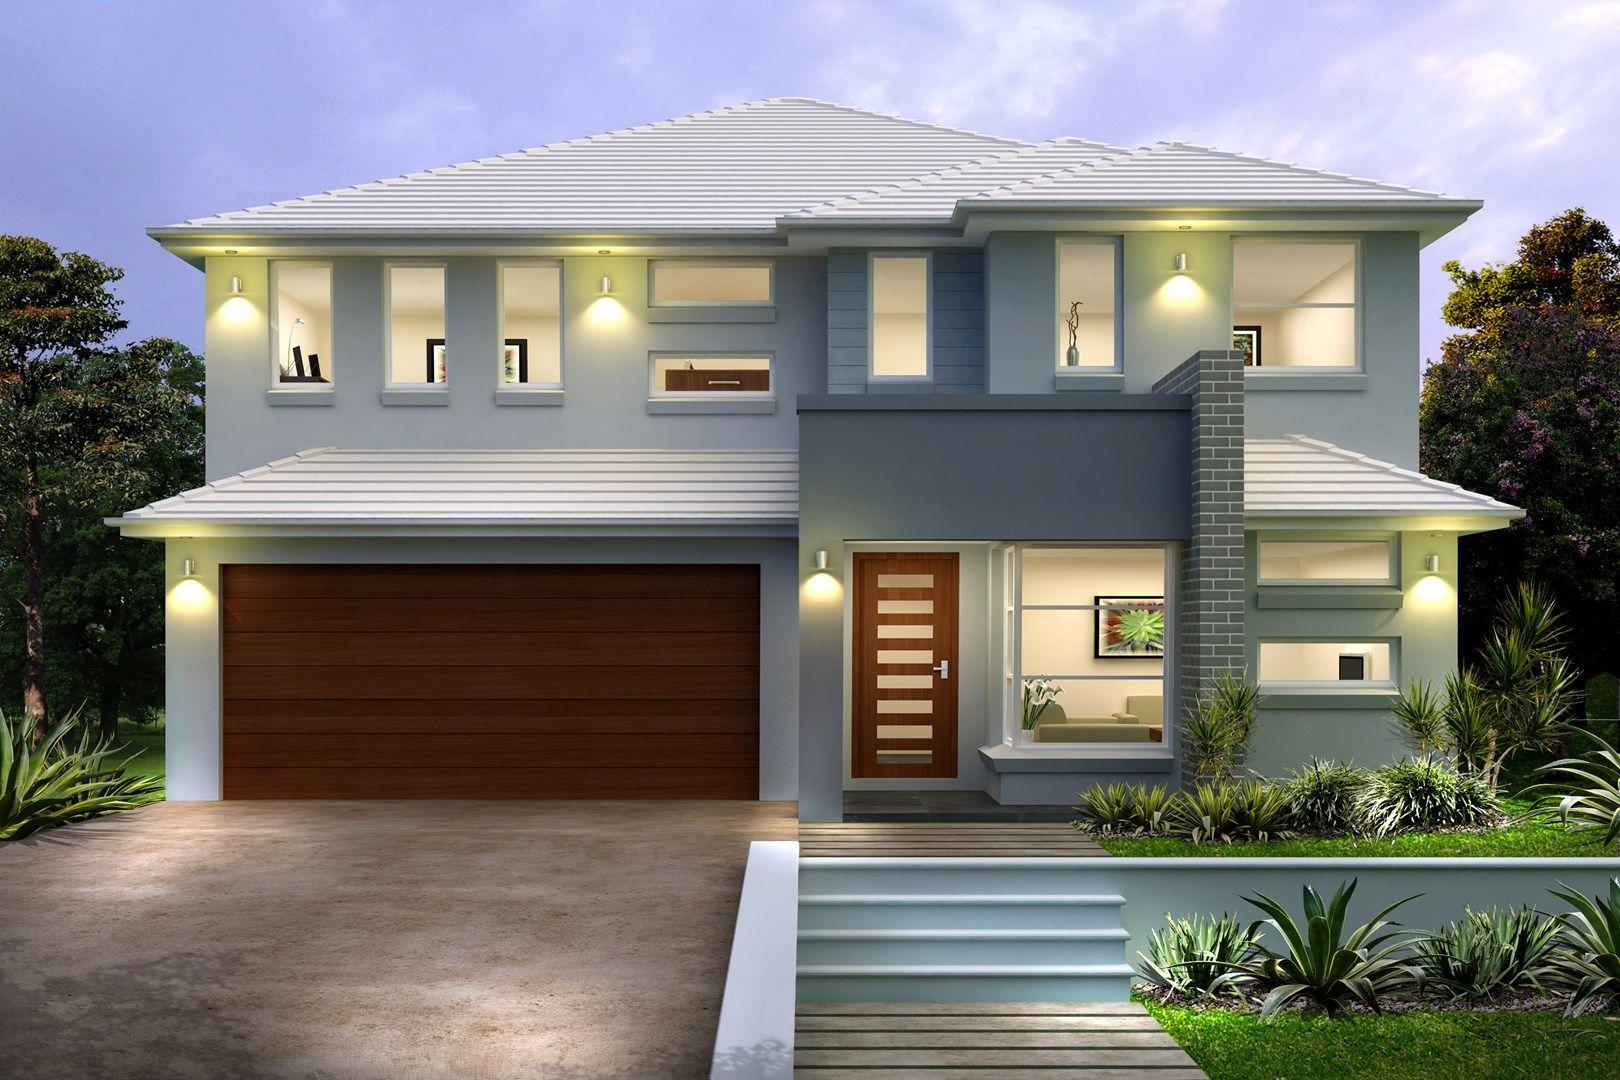 Lot 15 No 30 Seventeenth Avenue, Austral NSW 2179, Image 0